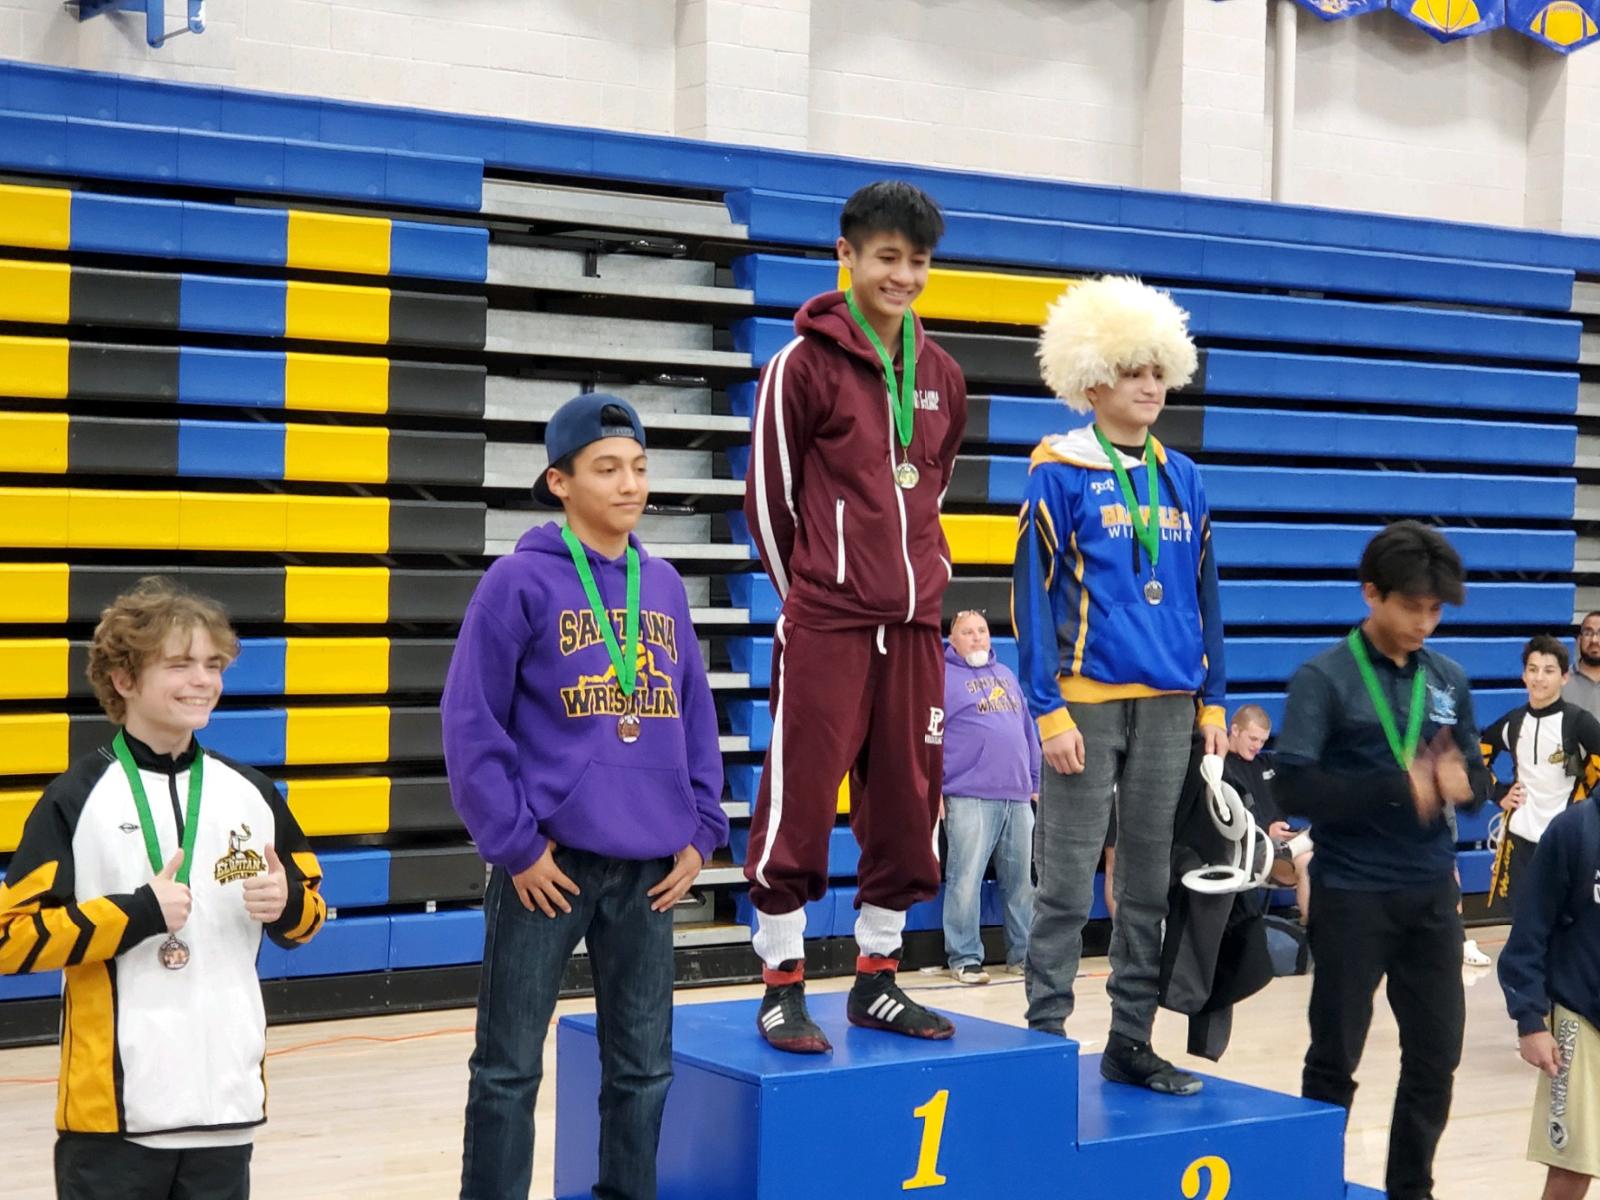 Wrestling CIF Champion and Podium Finishes!